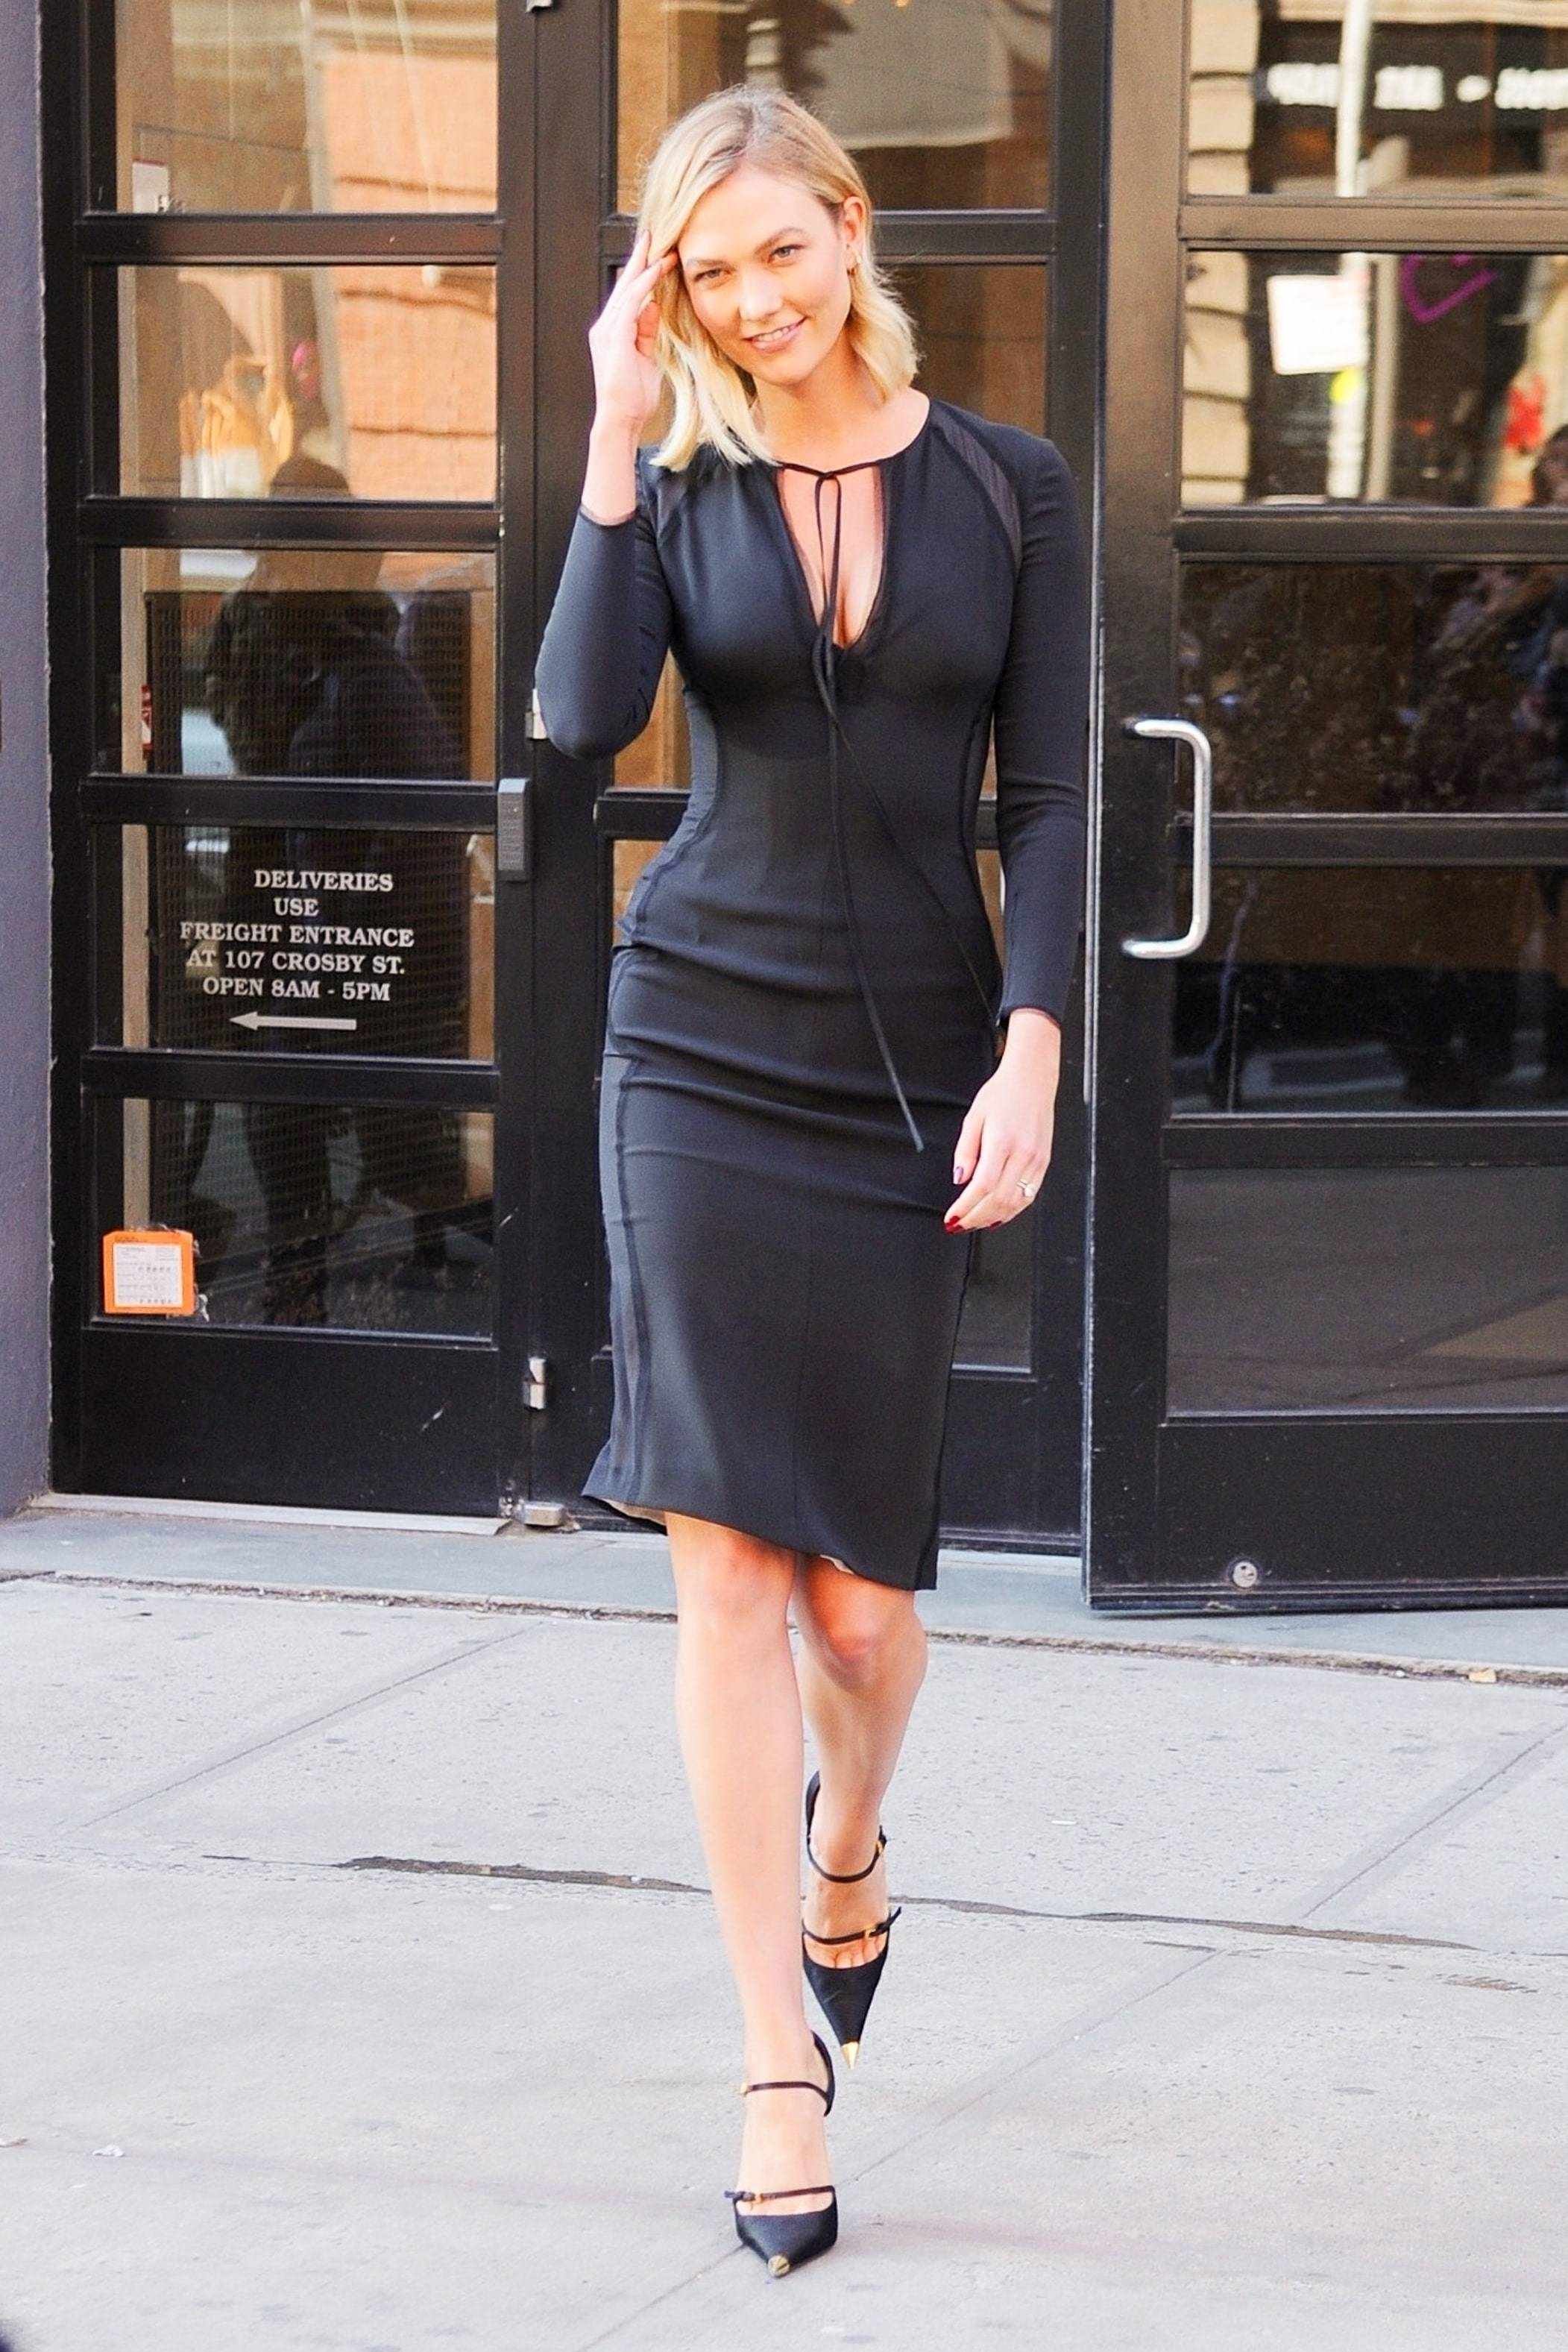 shoes spring outfits spring dress midi dress black dress karlie kloss celebrity pumps